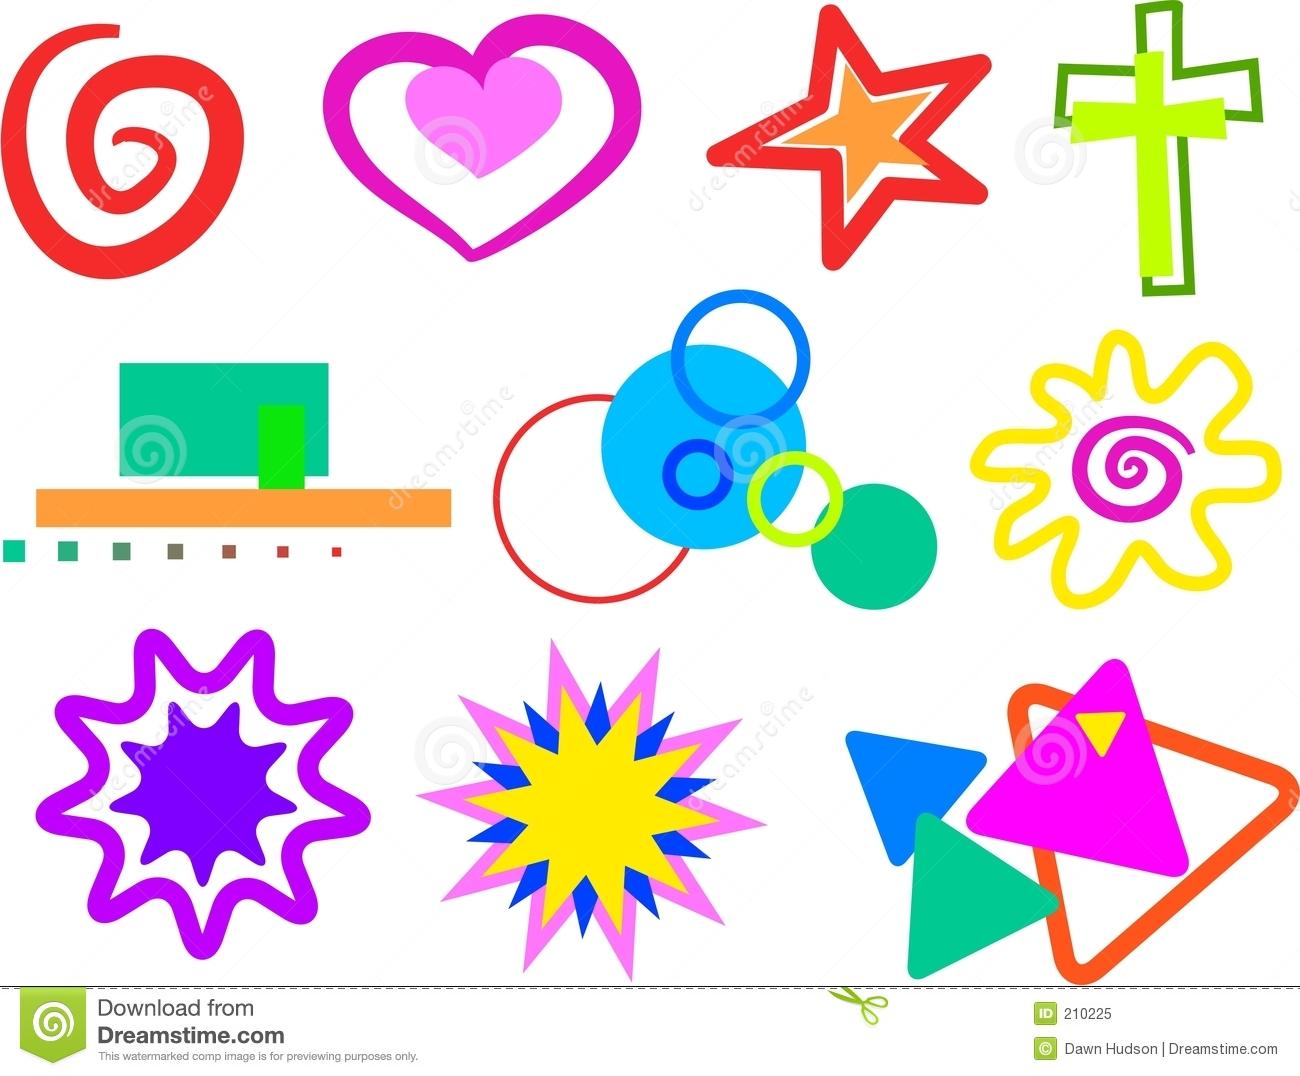 Clip Art Shapes Free Clip Art .-clip art shapes free clip art .-2